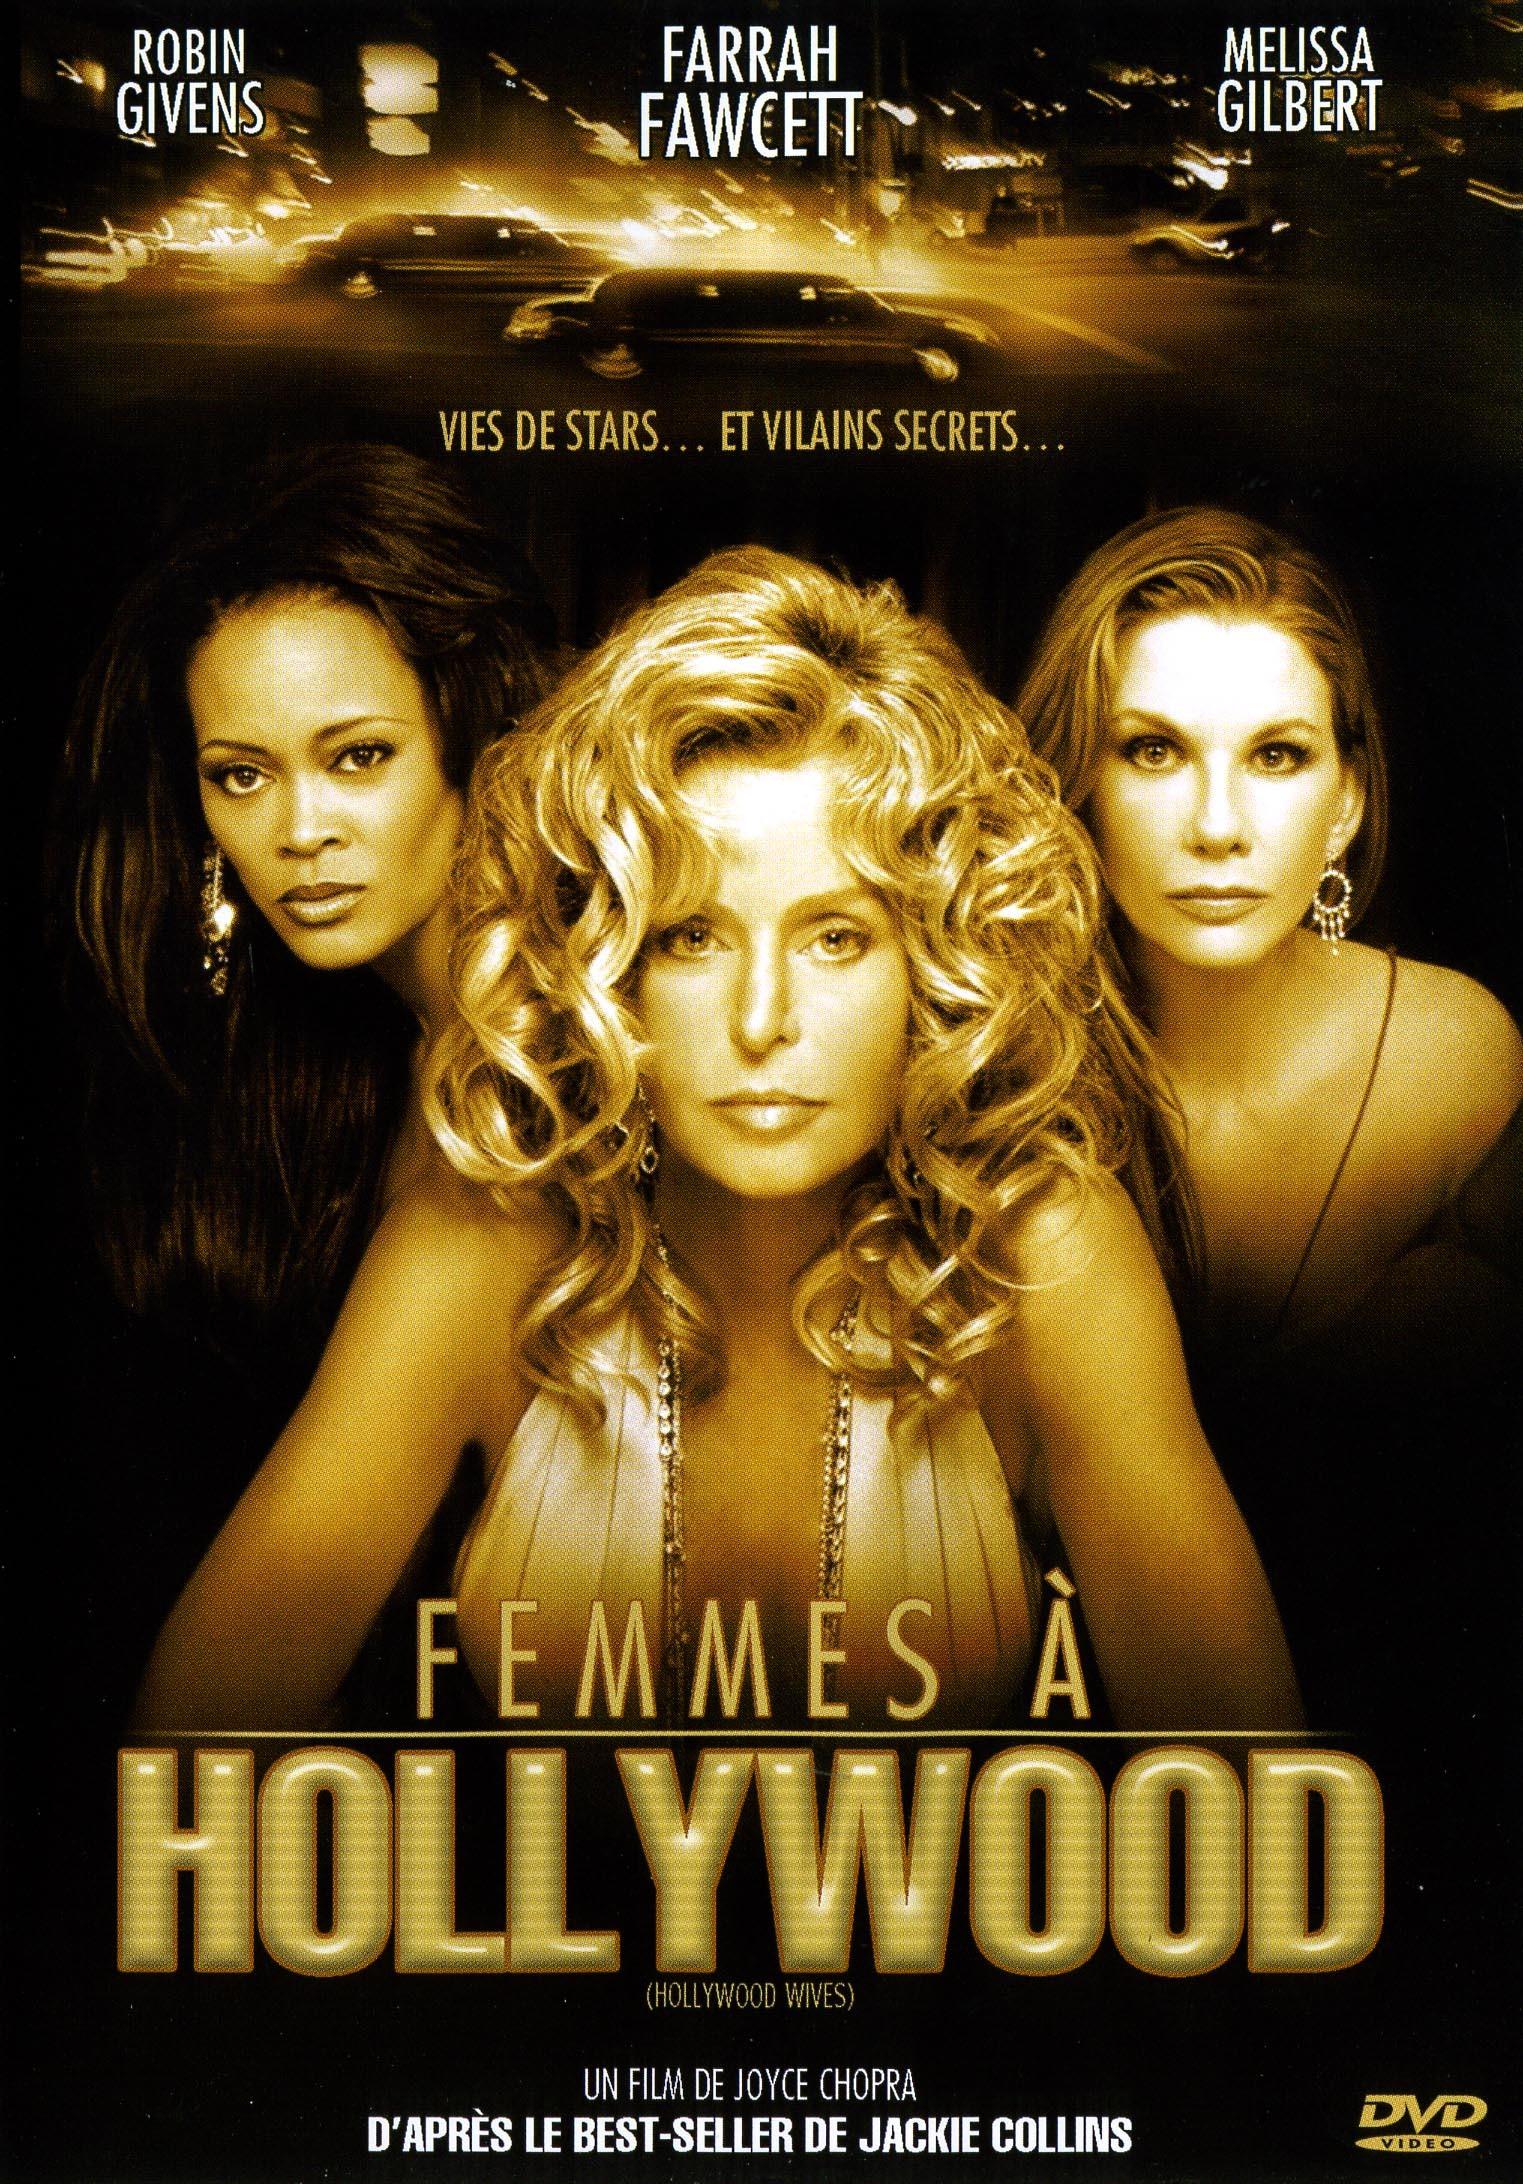 FEMMES A HOLLYWOOD - DVD